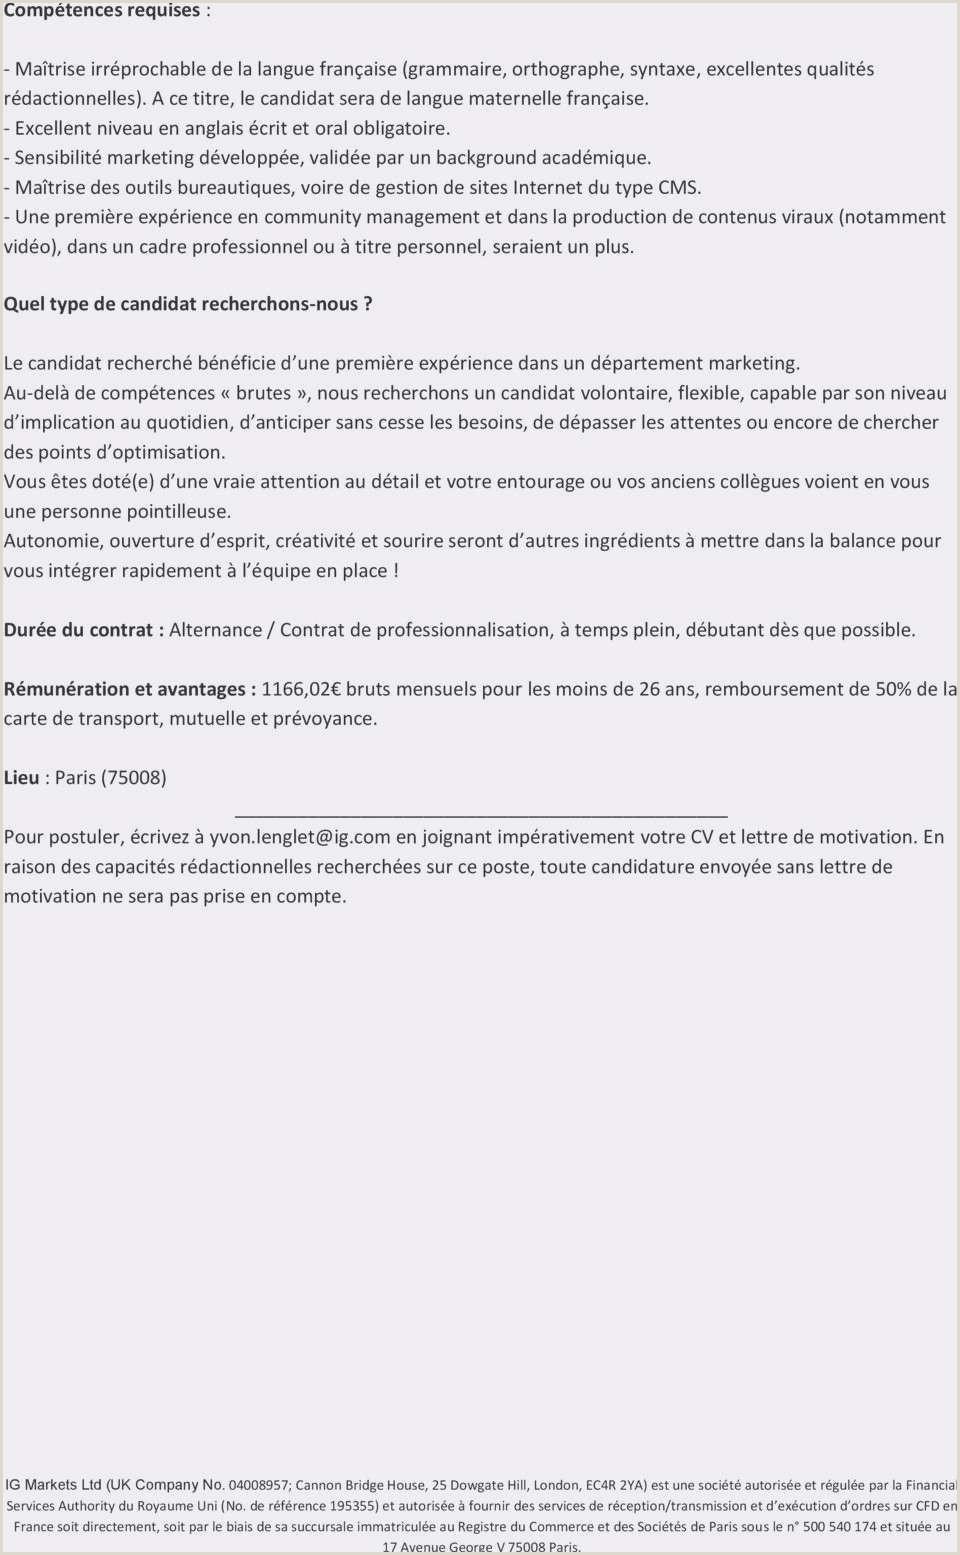 Cv Et Lettre Cv Et Lettre Modele Lettre Cv Modele Annonce